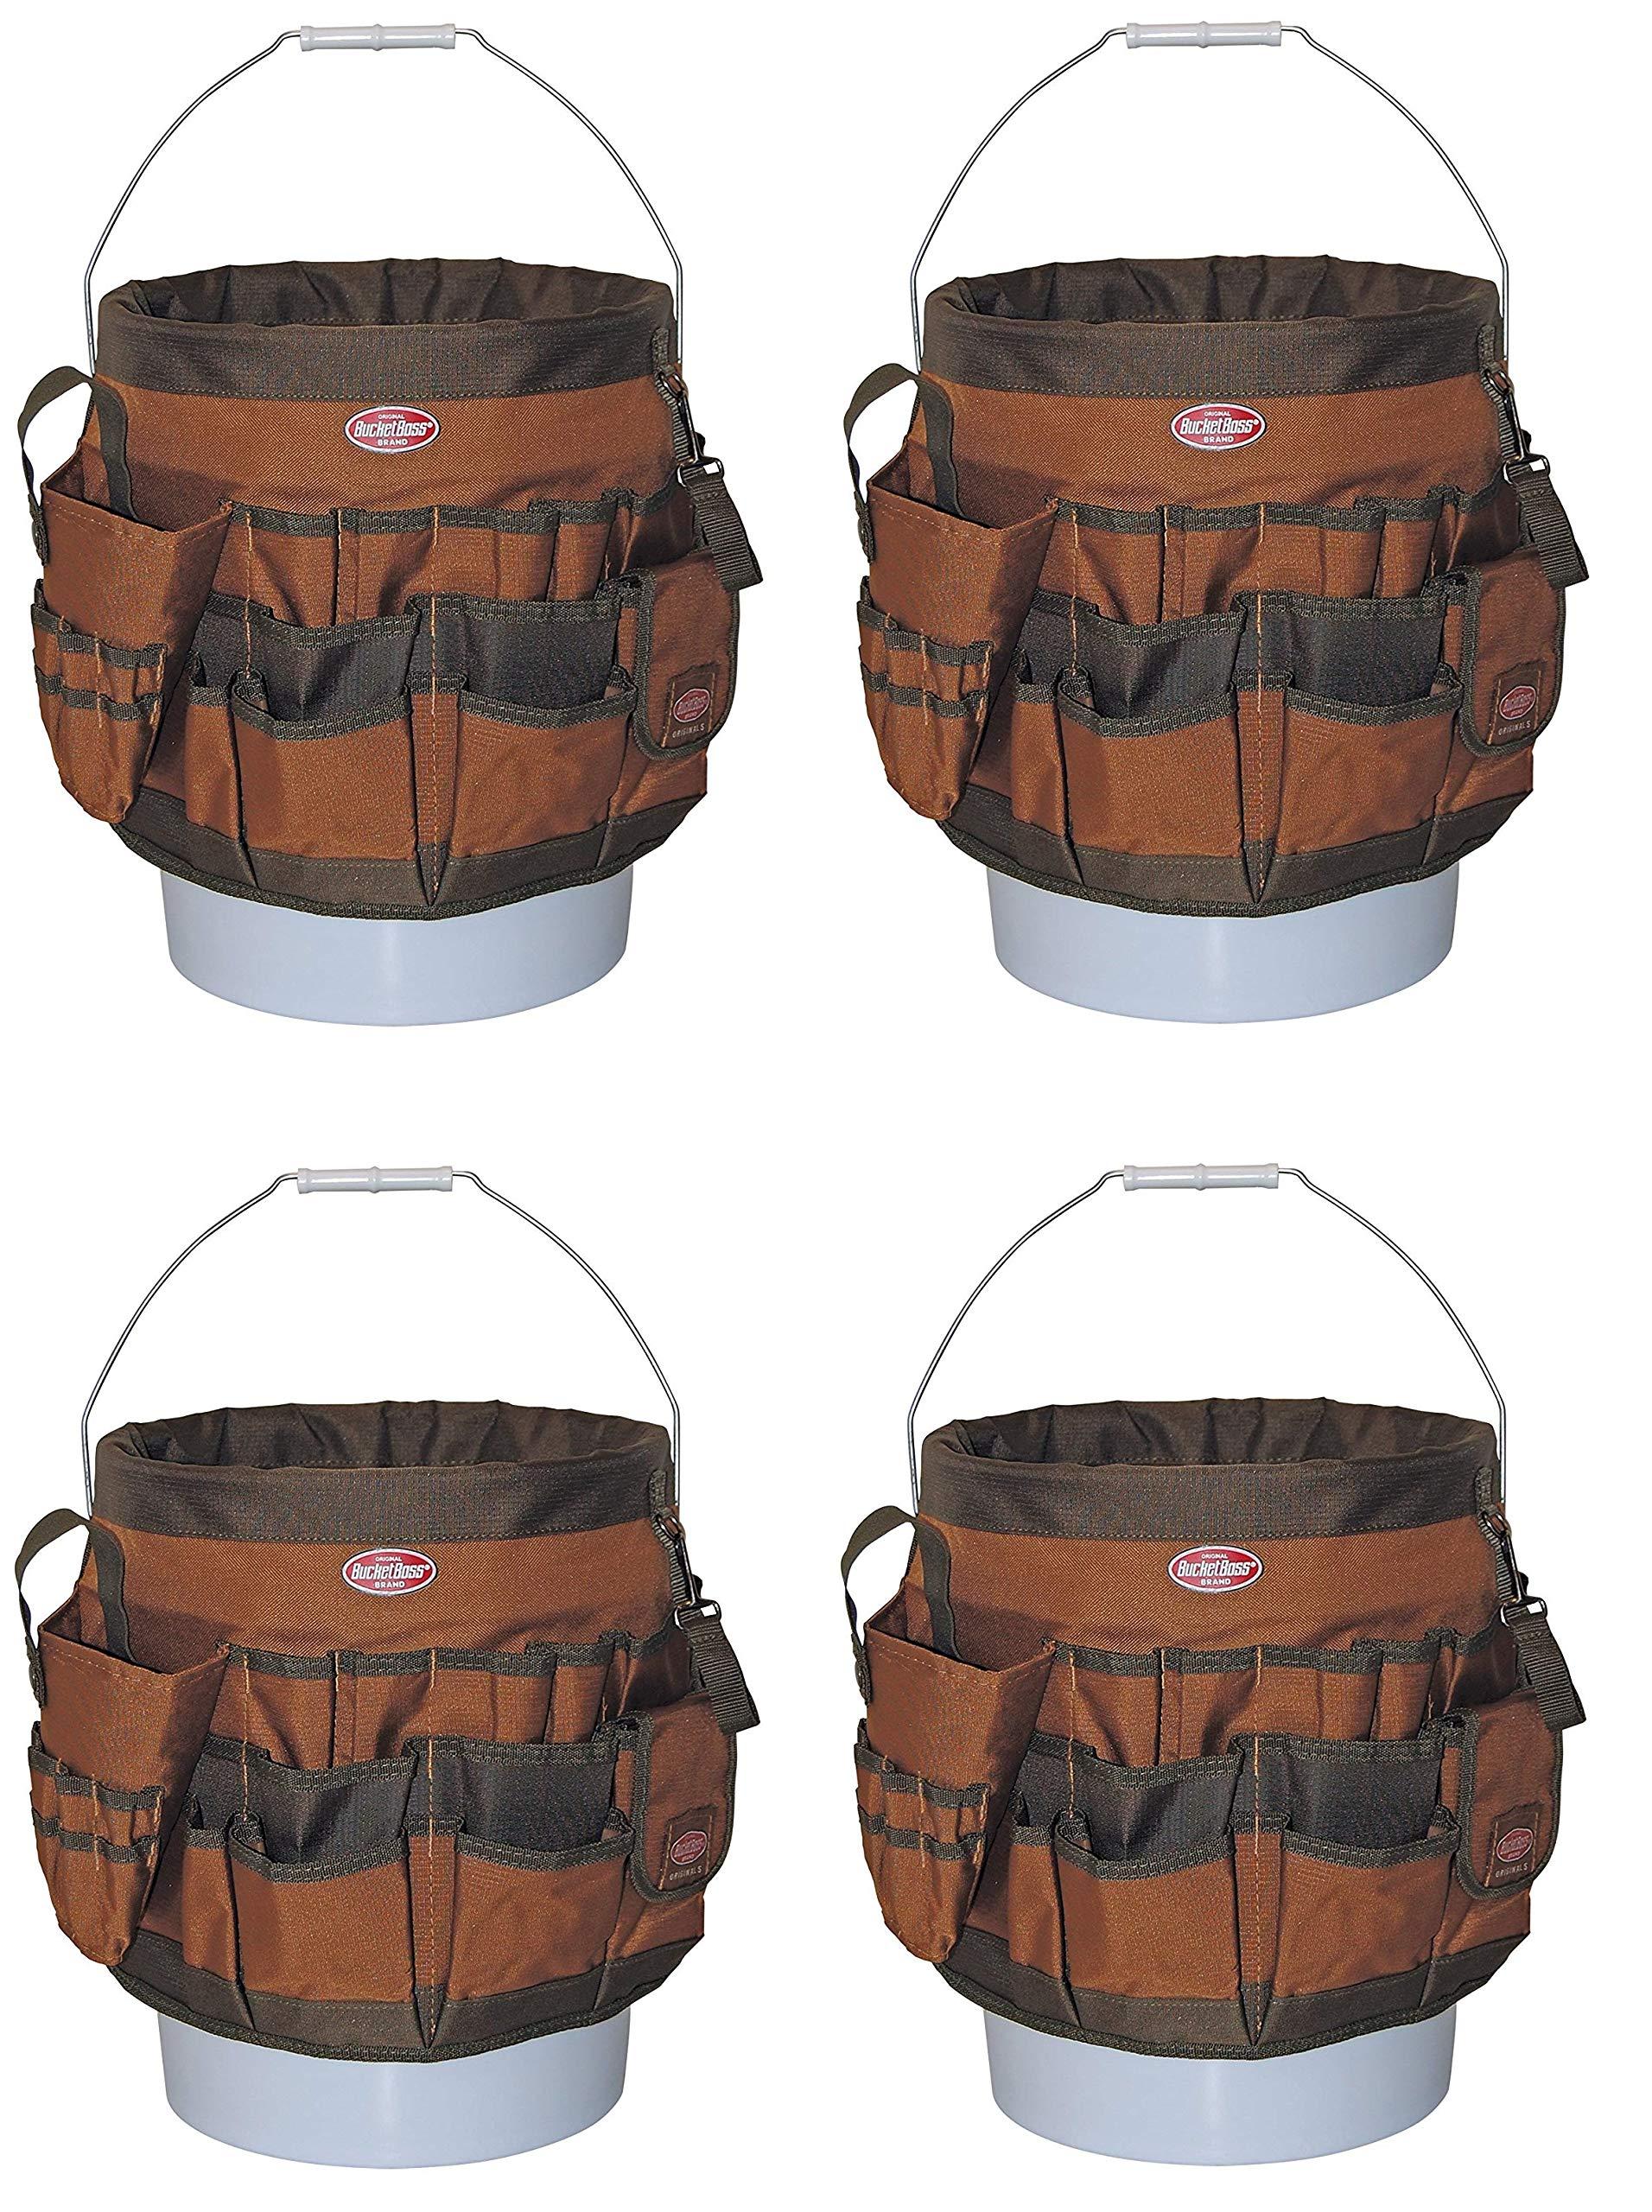 Bucket Boss 10056 Bucket Tool Organizer with 56 Pocket (Pack of 4)